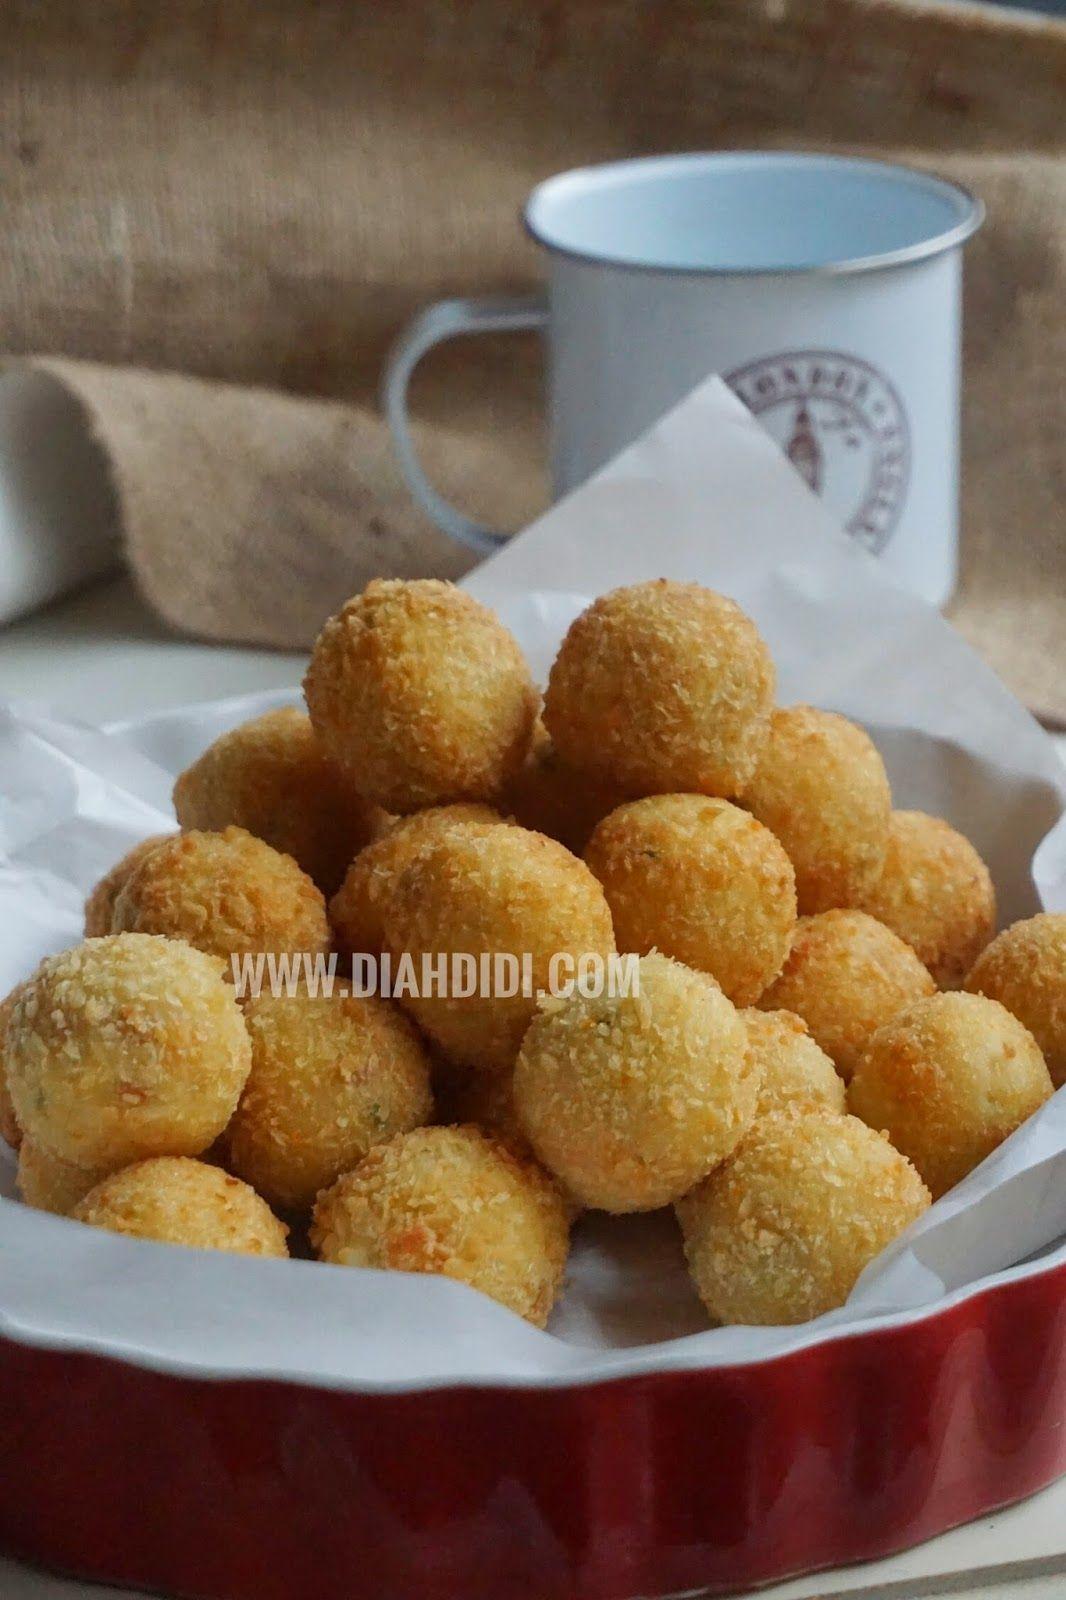 Diah Didi S Kitchen Bitterballen Ayam Sosis Resep Masakan Ramadhan Makanan Resep Masakan